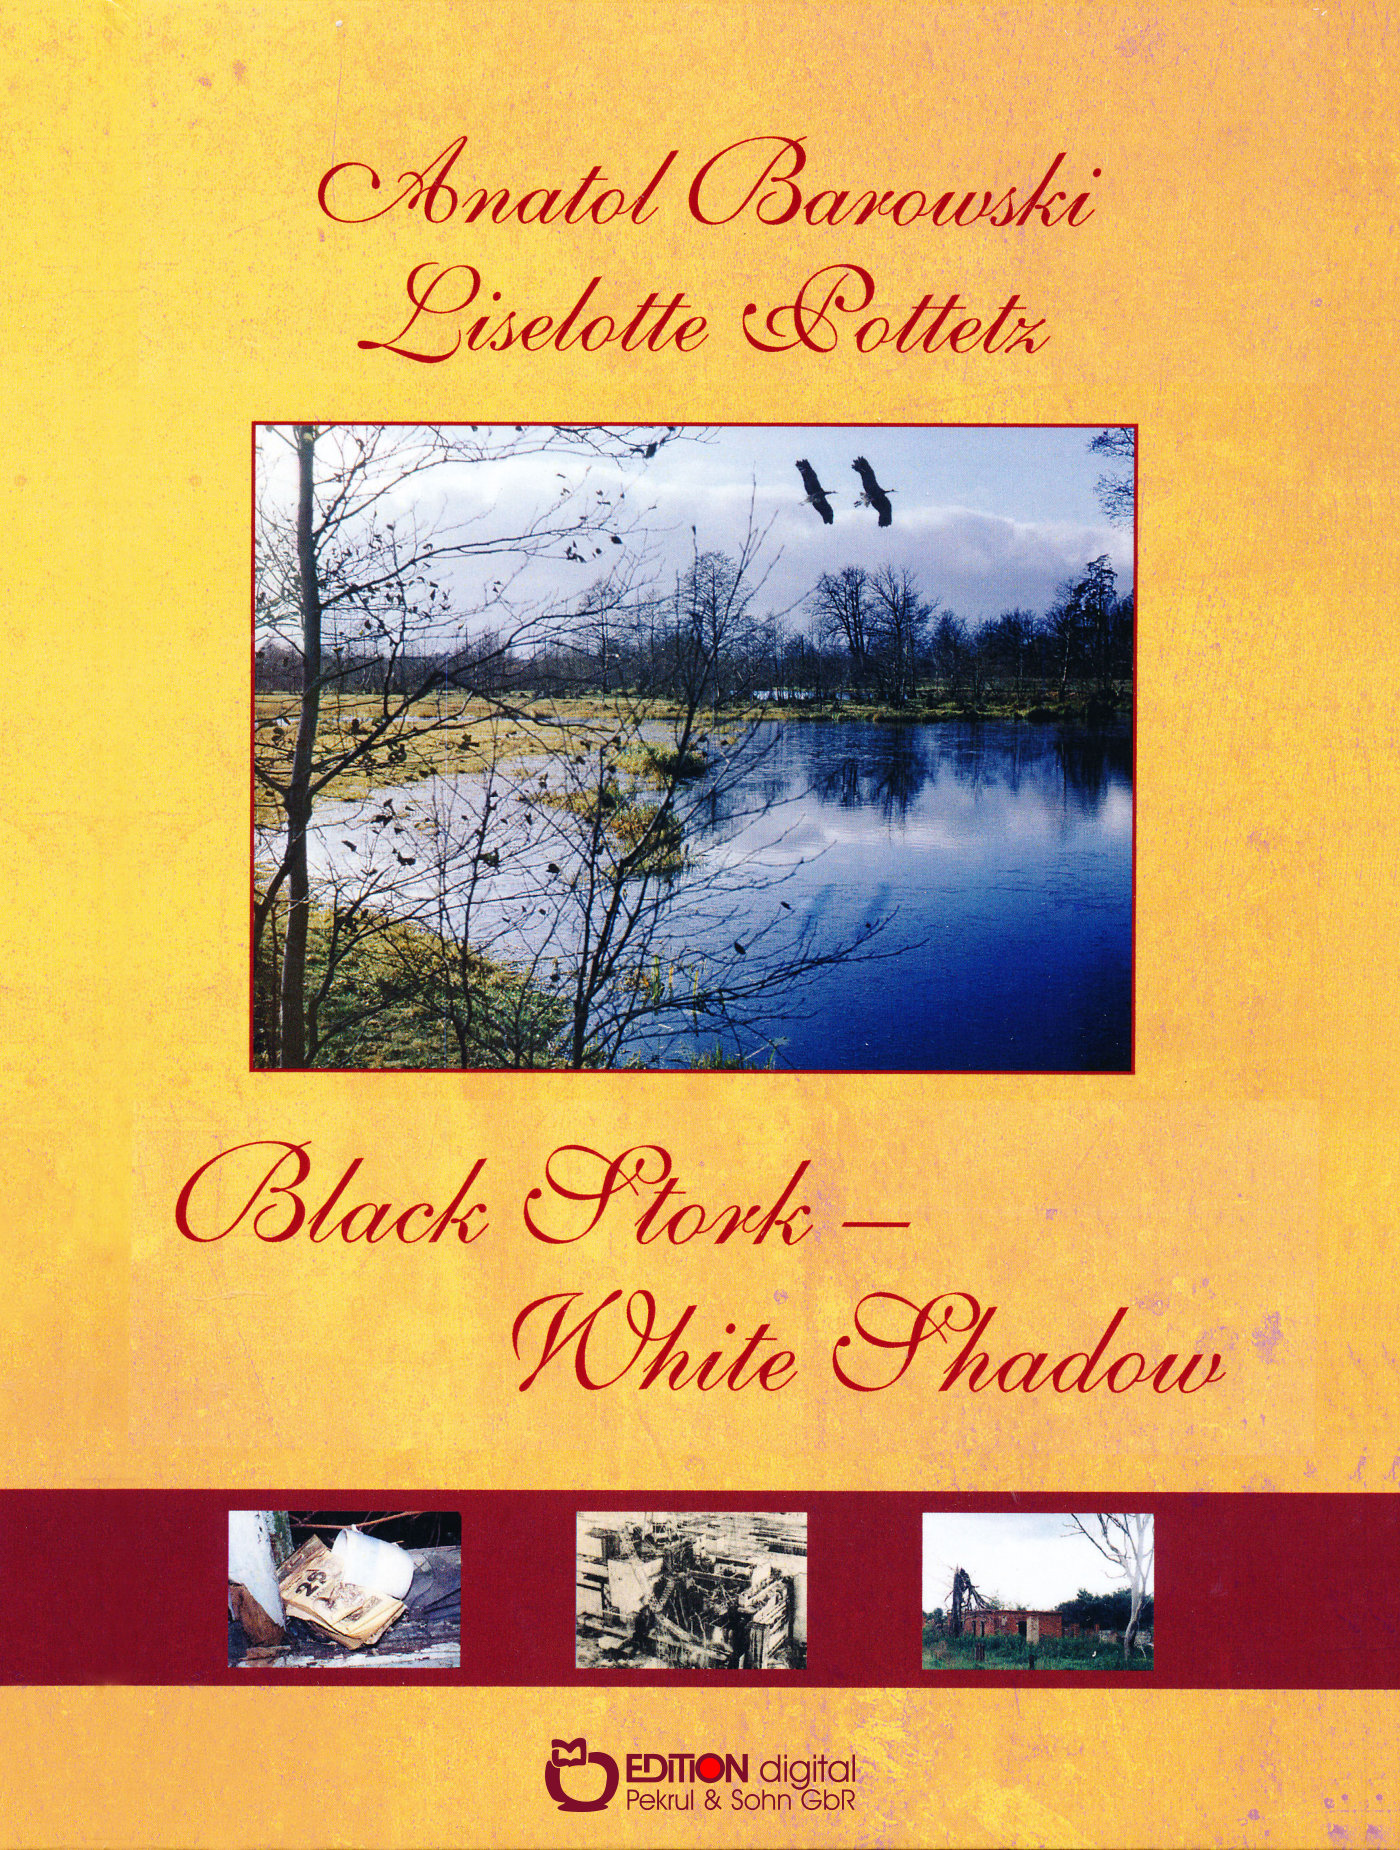 Black Stork - White Shadow von Liselotte Pottetz, Anatol Barowski